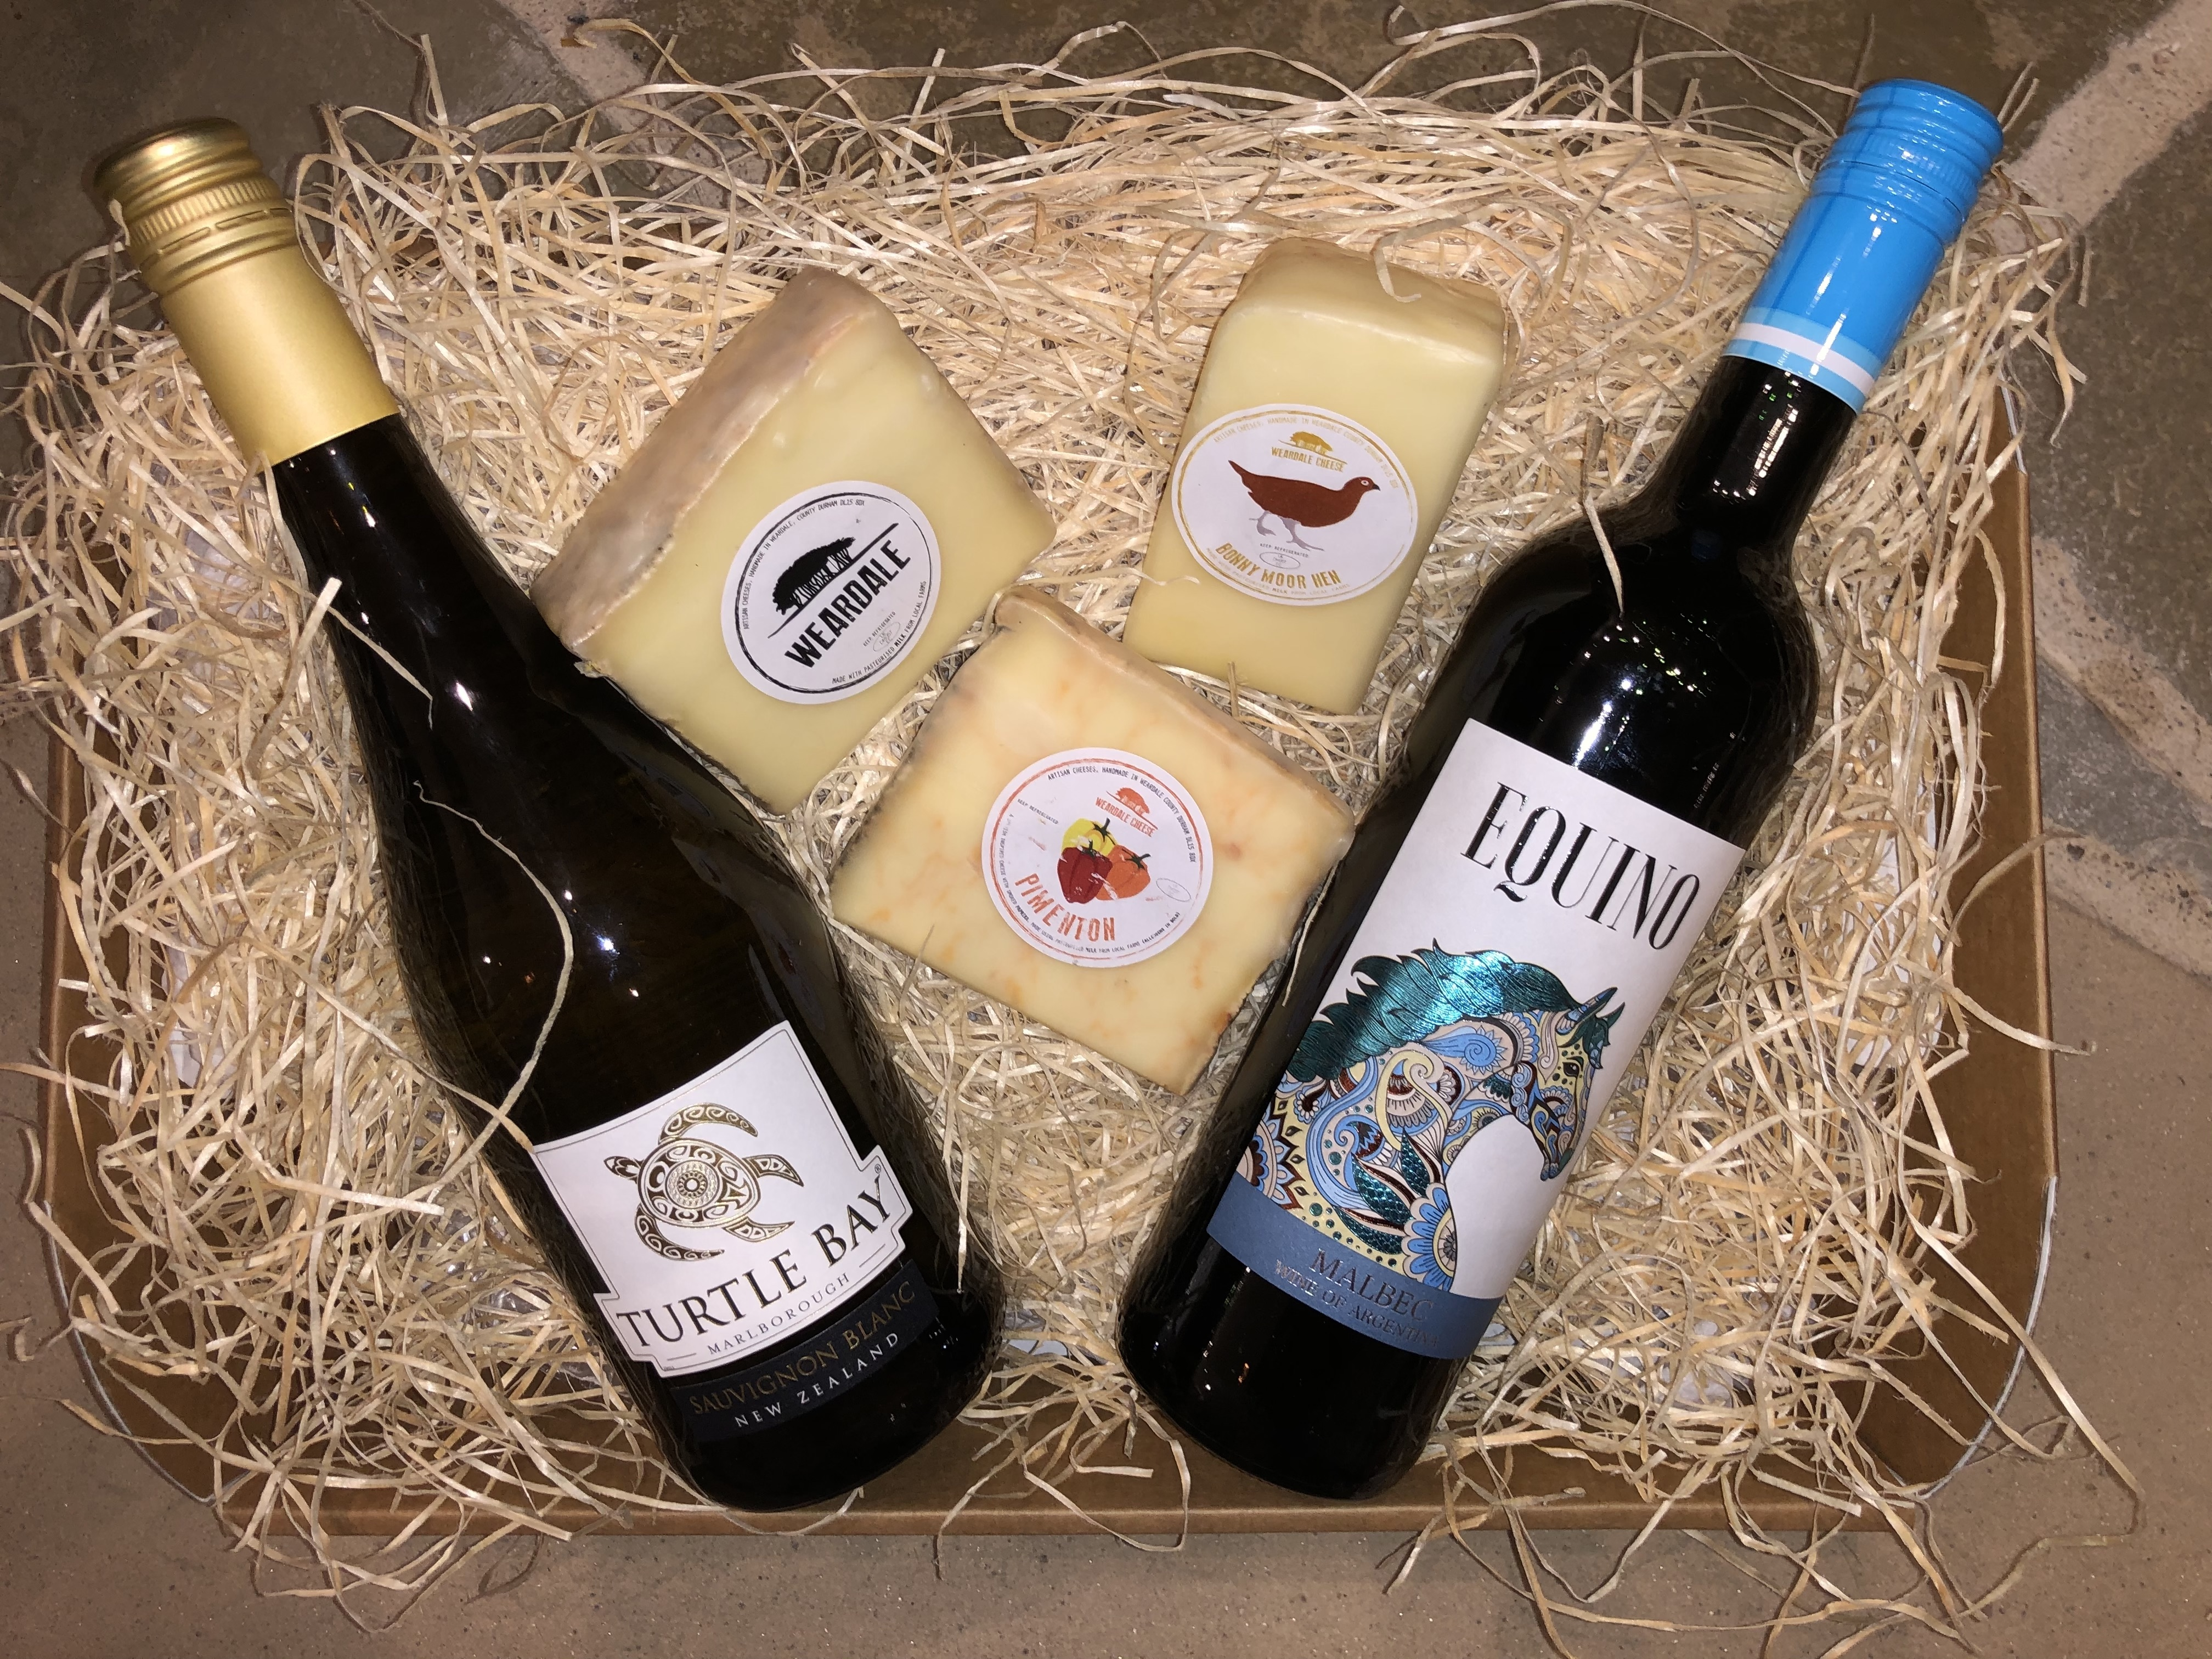 Clarks Hamper - Wine & Cheese